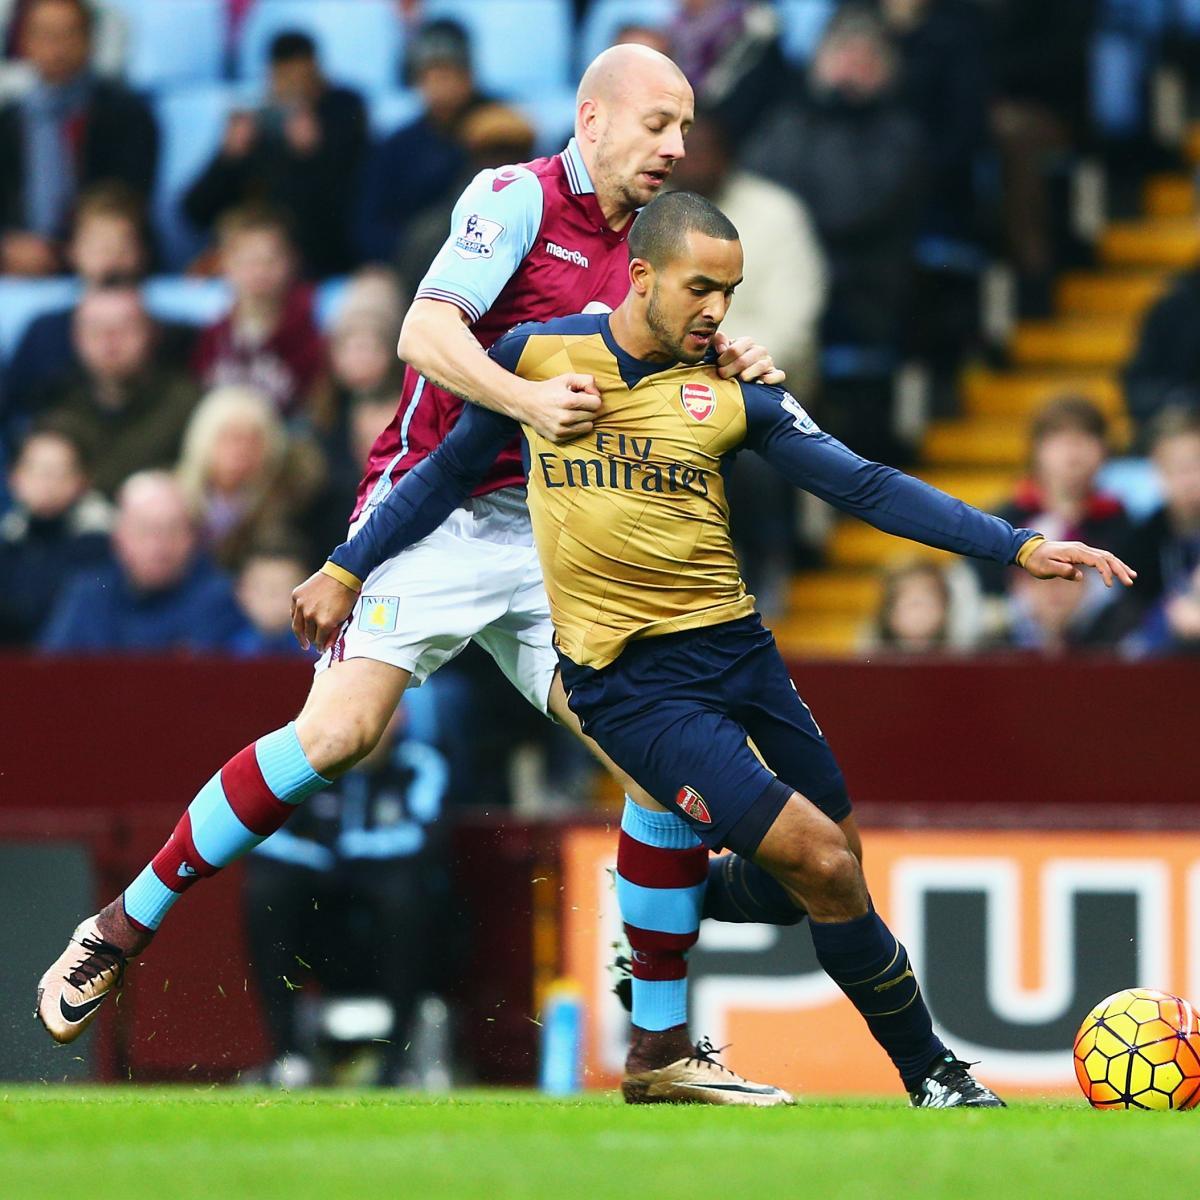 Aston Villa - Arsenal Live Streaming and TV Listings, Live ...